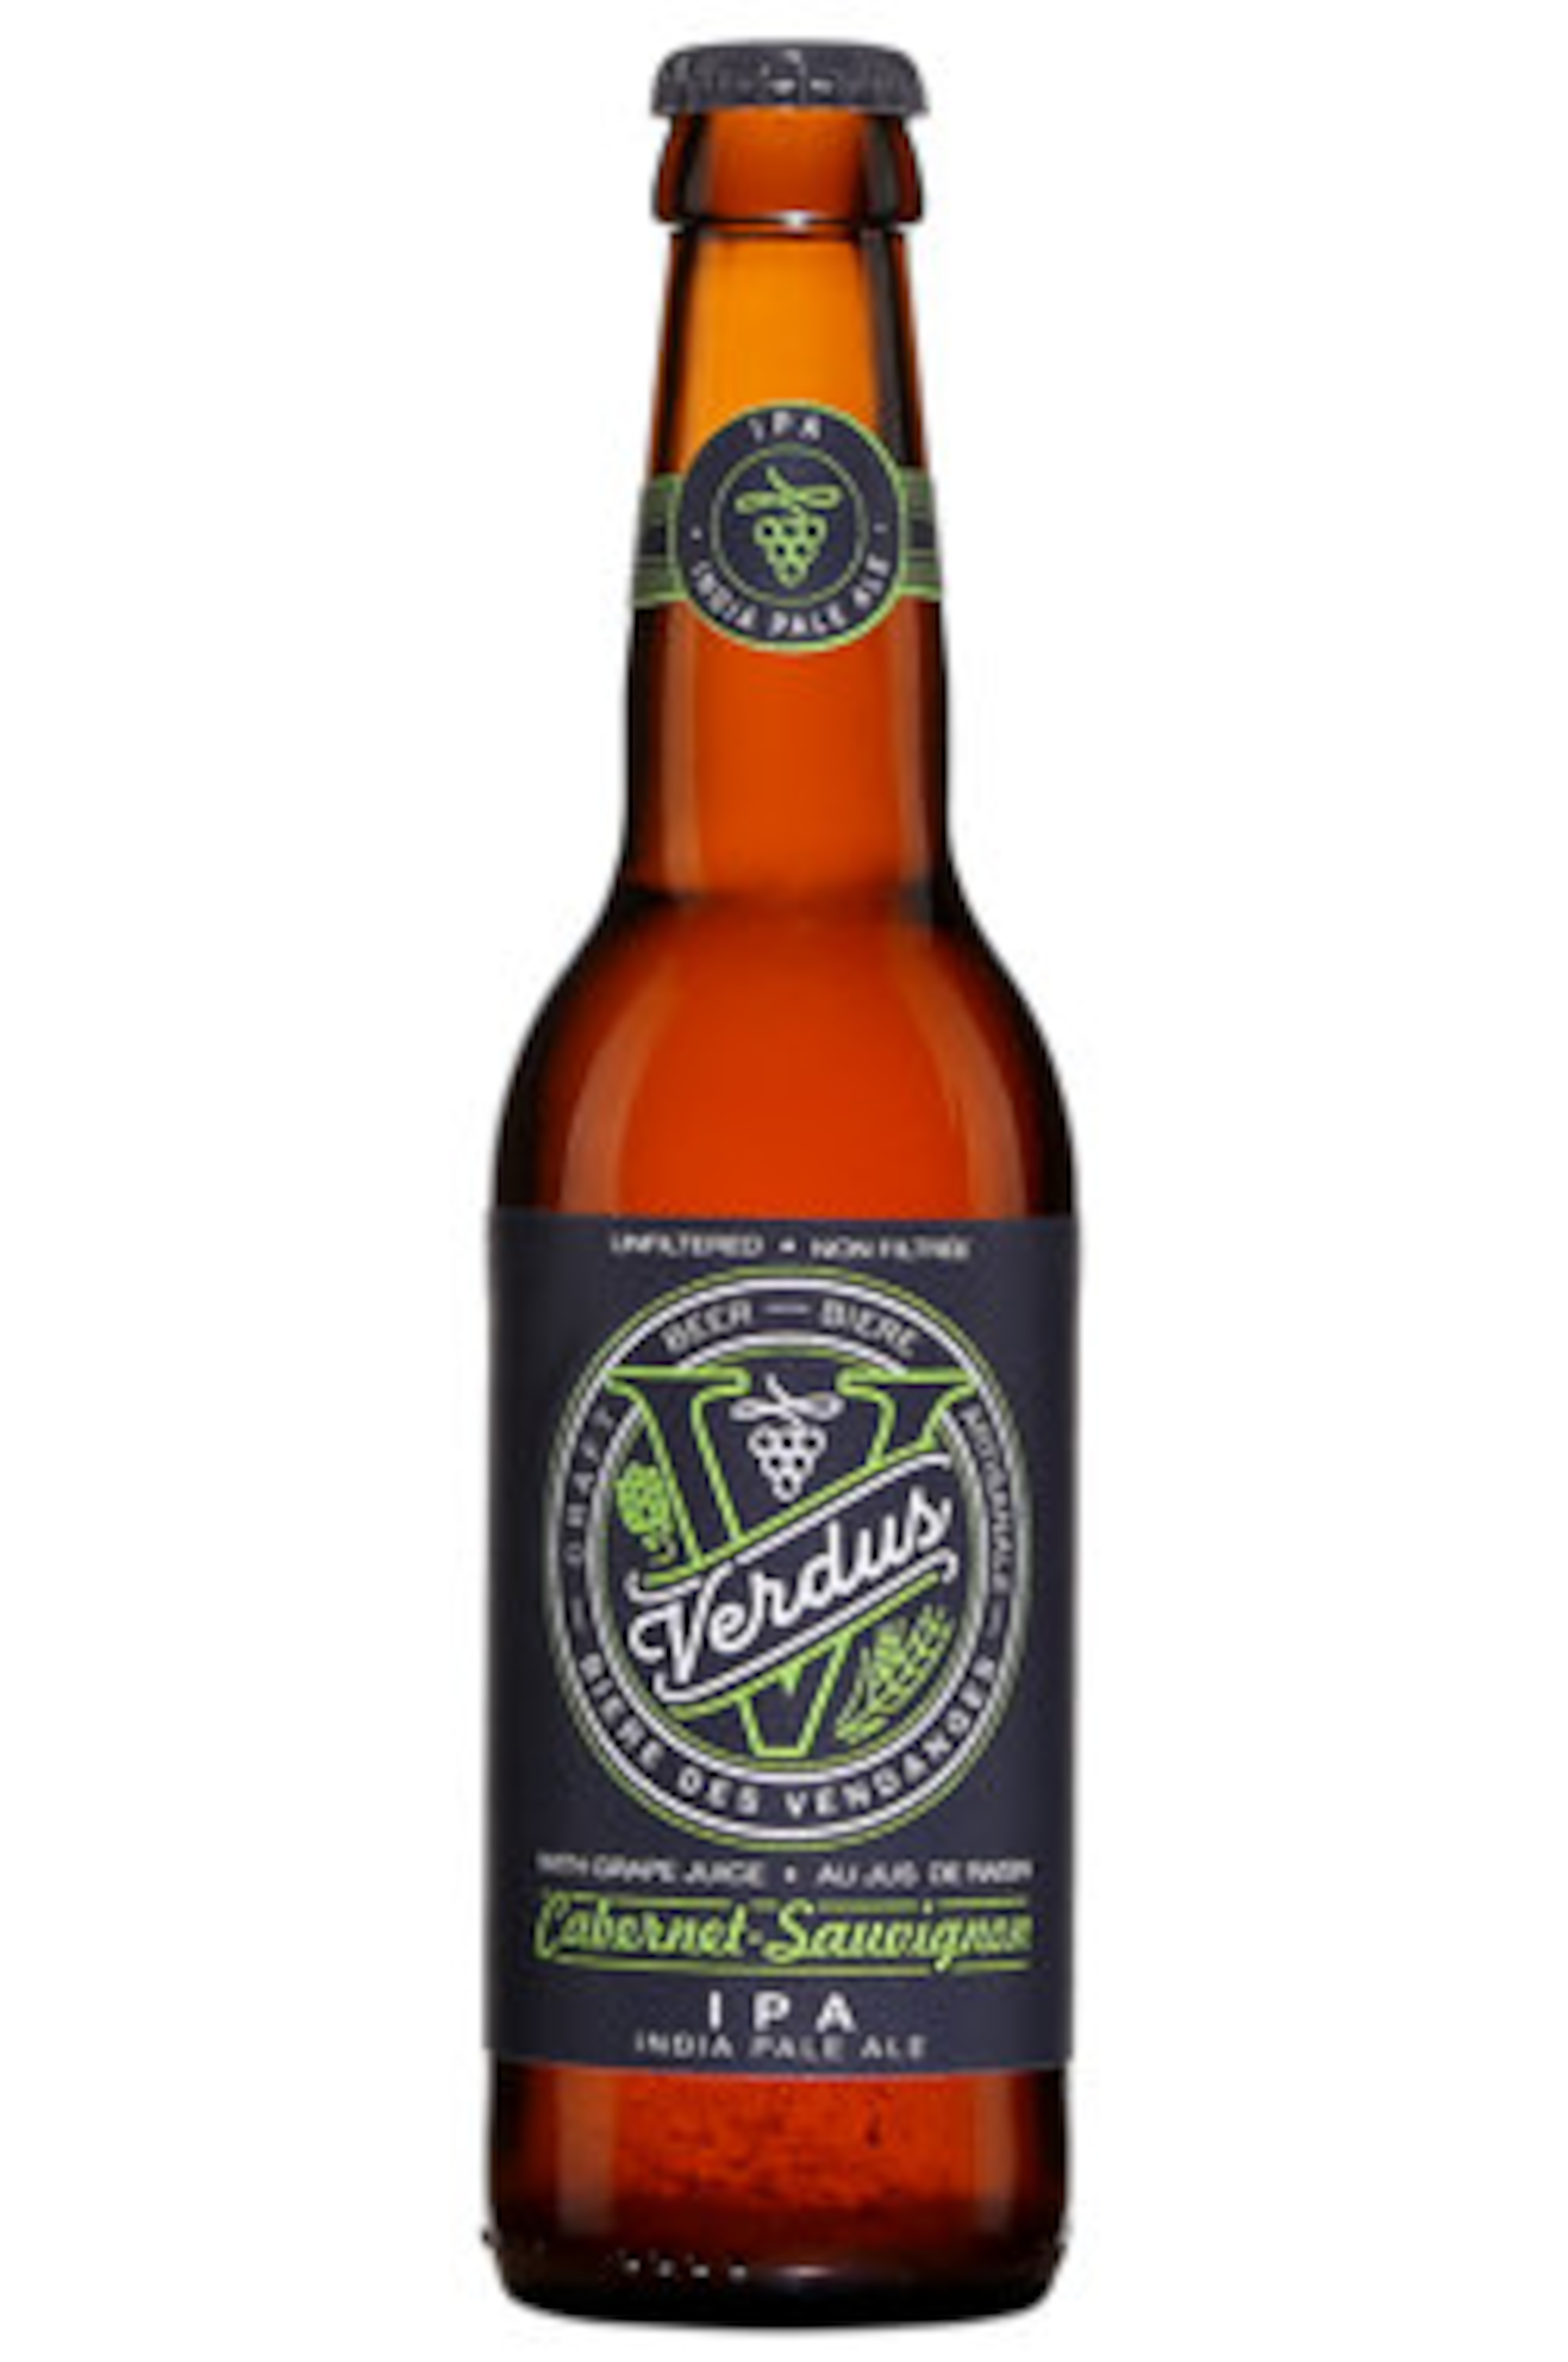 Verdus Cabernet-Sauvignon India Pale Ale   Code SAQ 13632470   4,95 $ (330 ml)